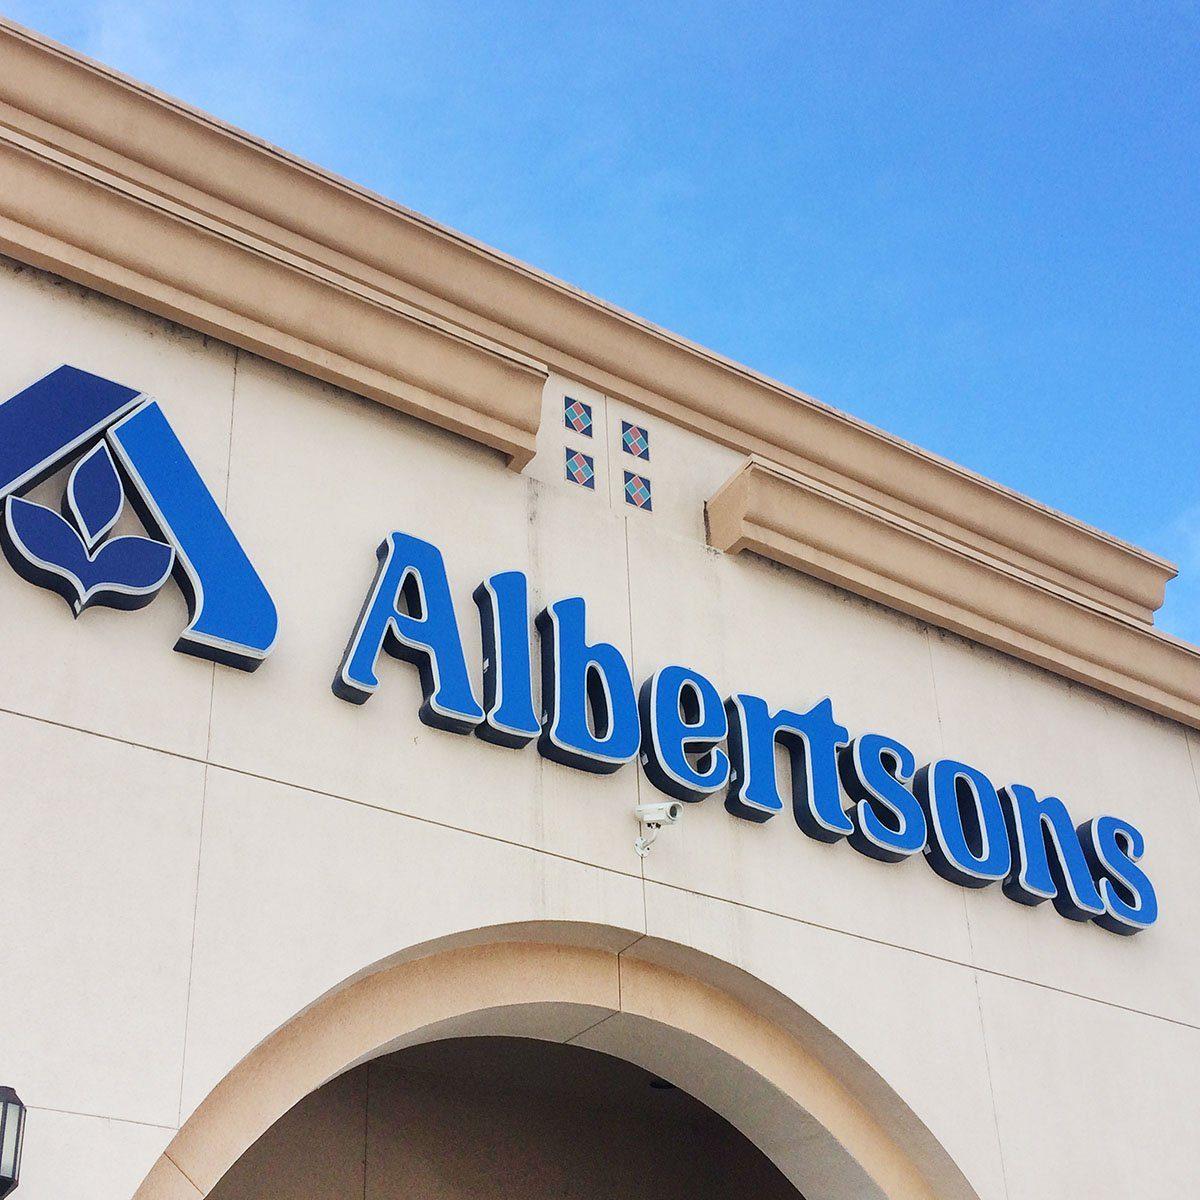 Albertsons store in Buellton, California